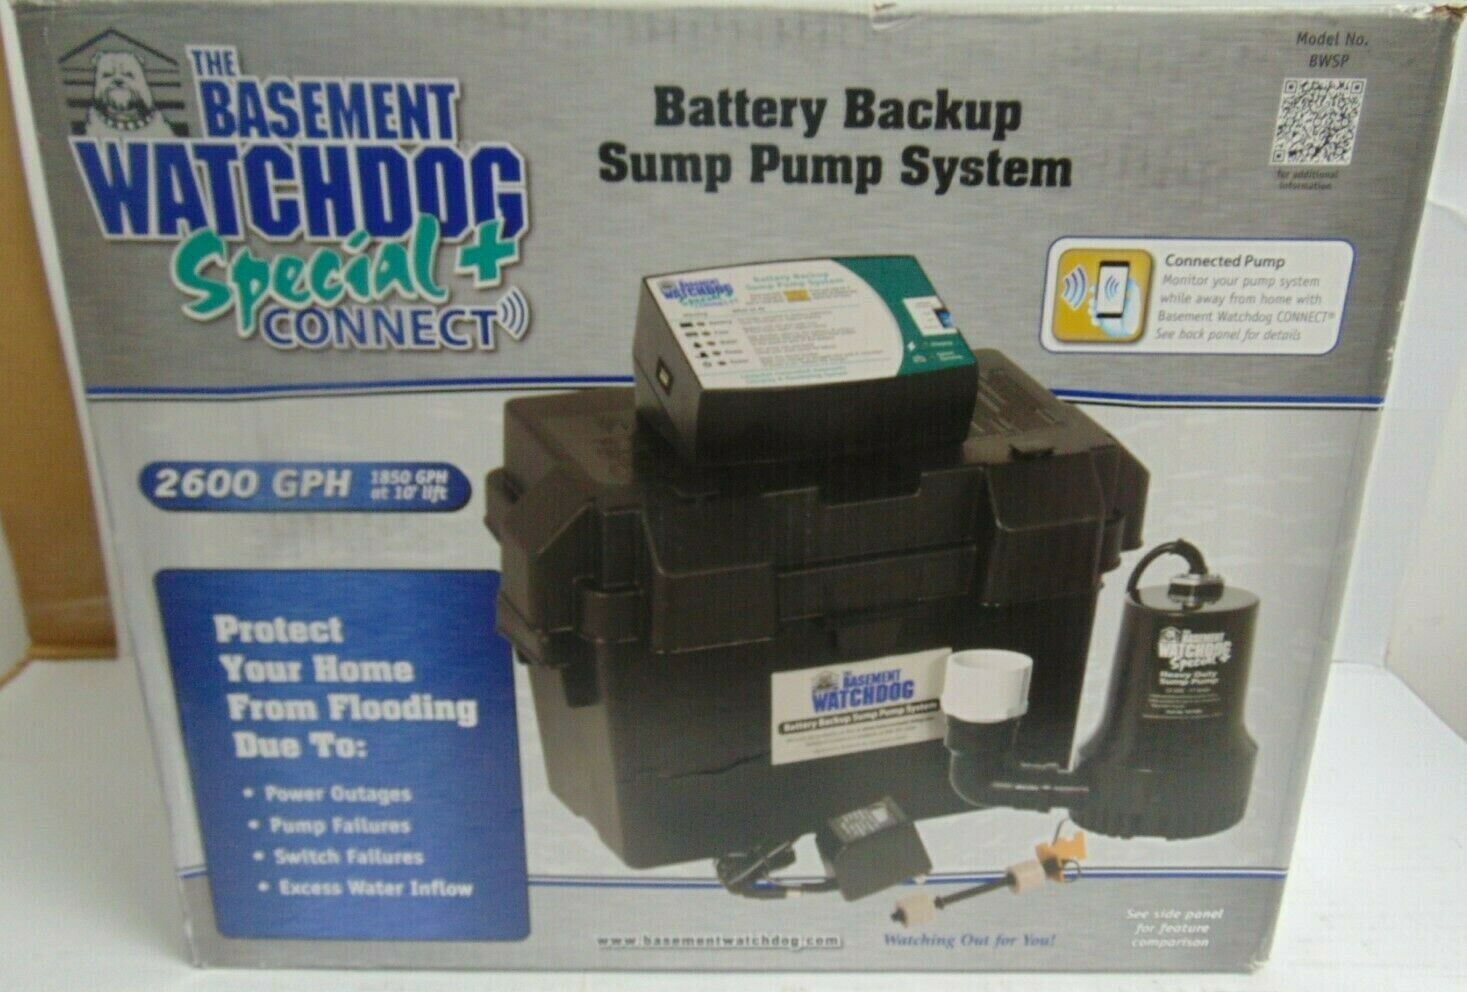 Basement Watchdog Special + Battery Back-Up Sump Pump System